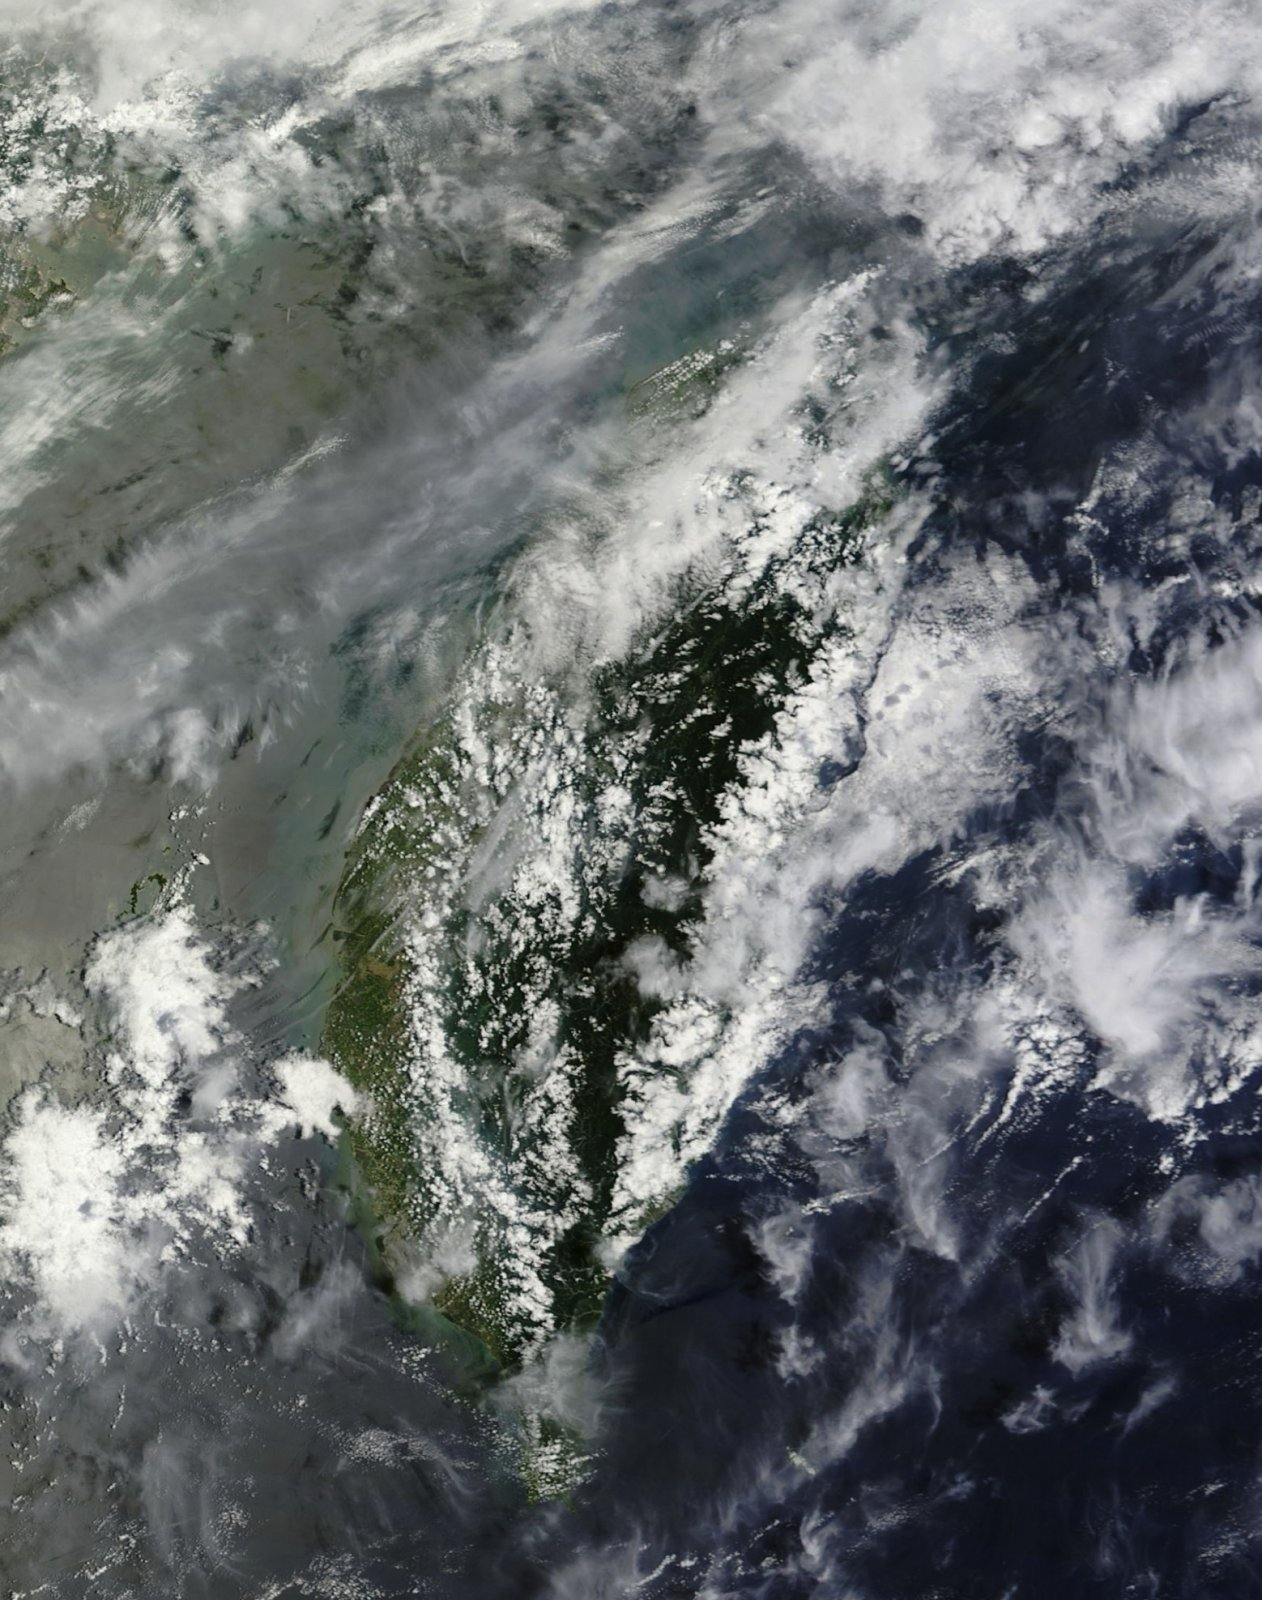 AERONET_NCU_Taiwan.2014170.terra.250m_crop.